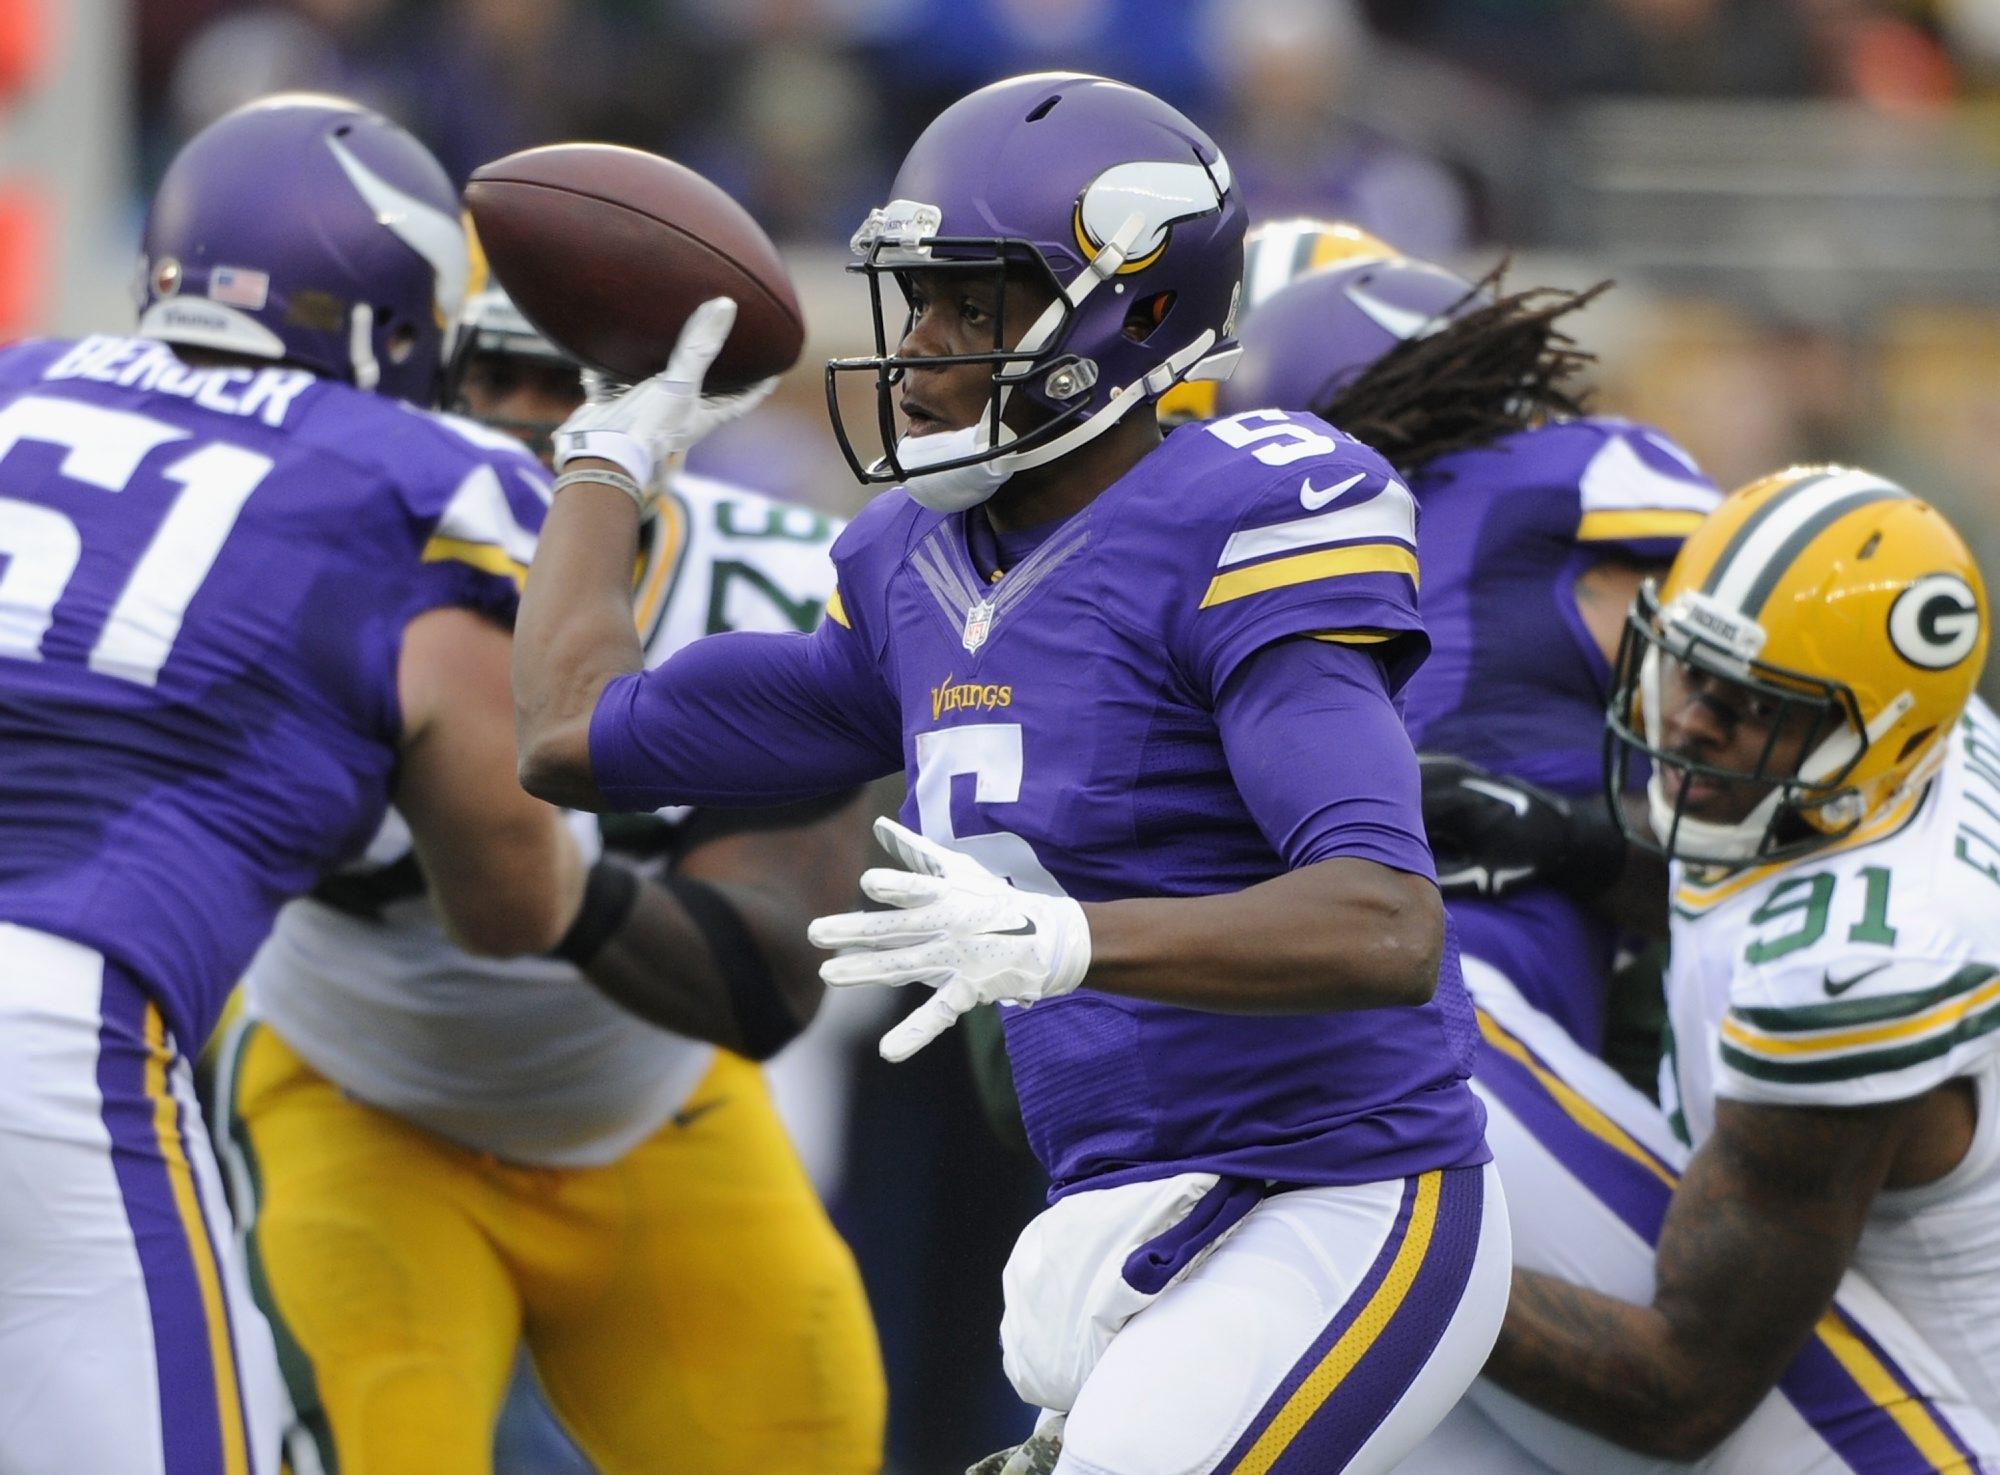 Teddy Bridgewater's season-ending injury has put the Minnesota Vikings in a quarterback bind.